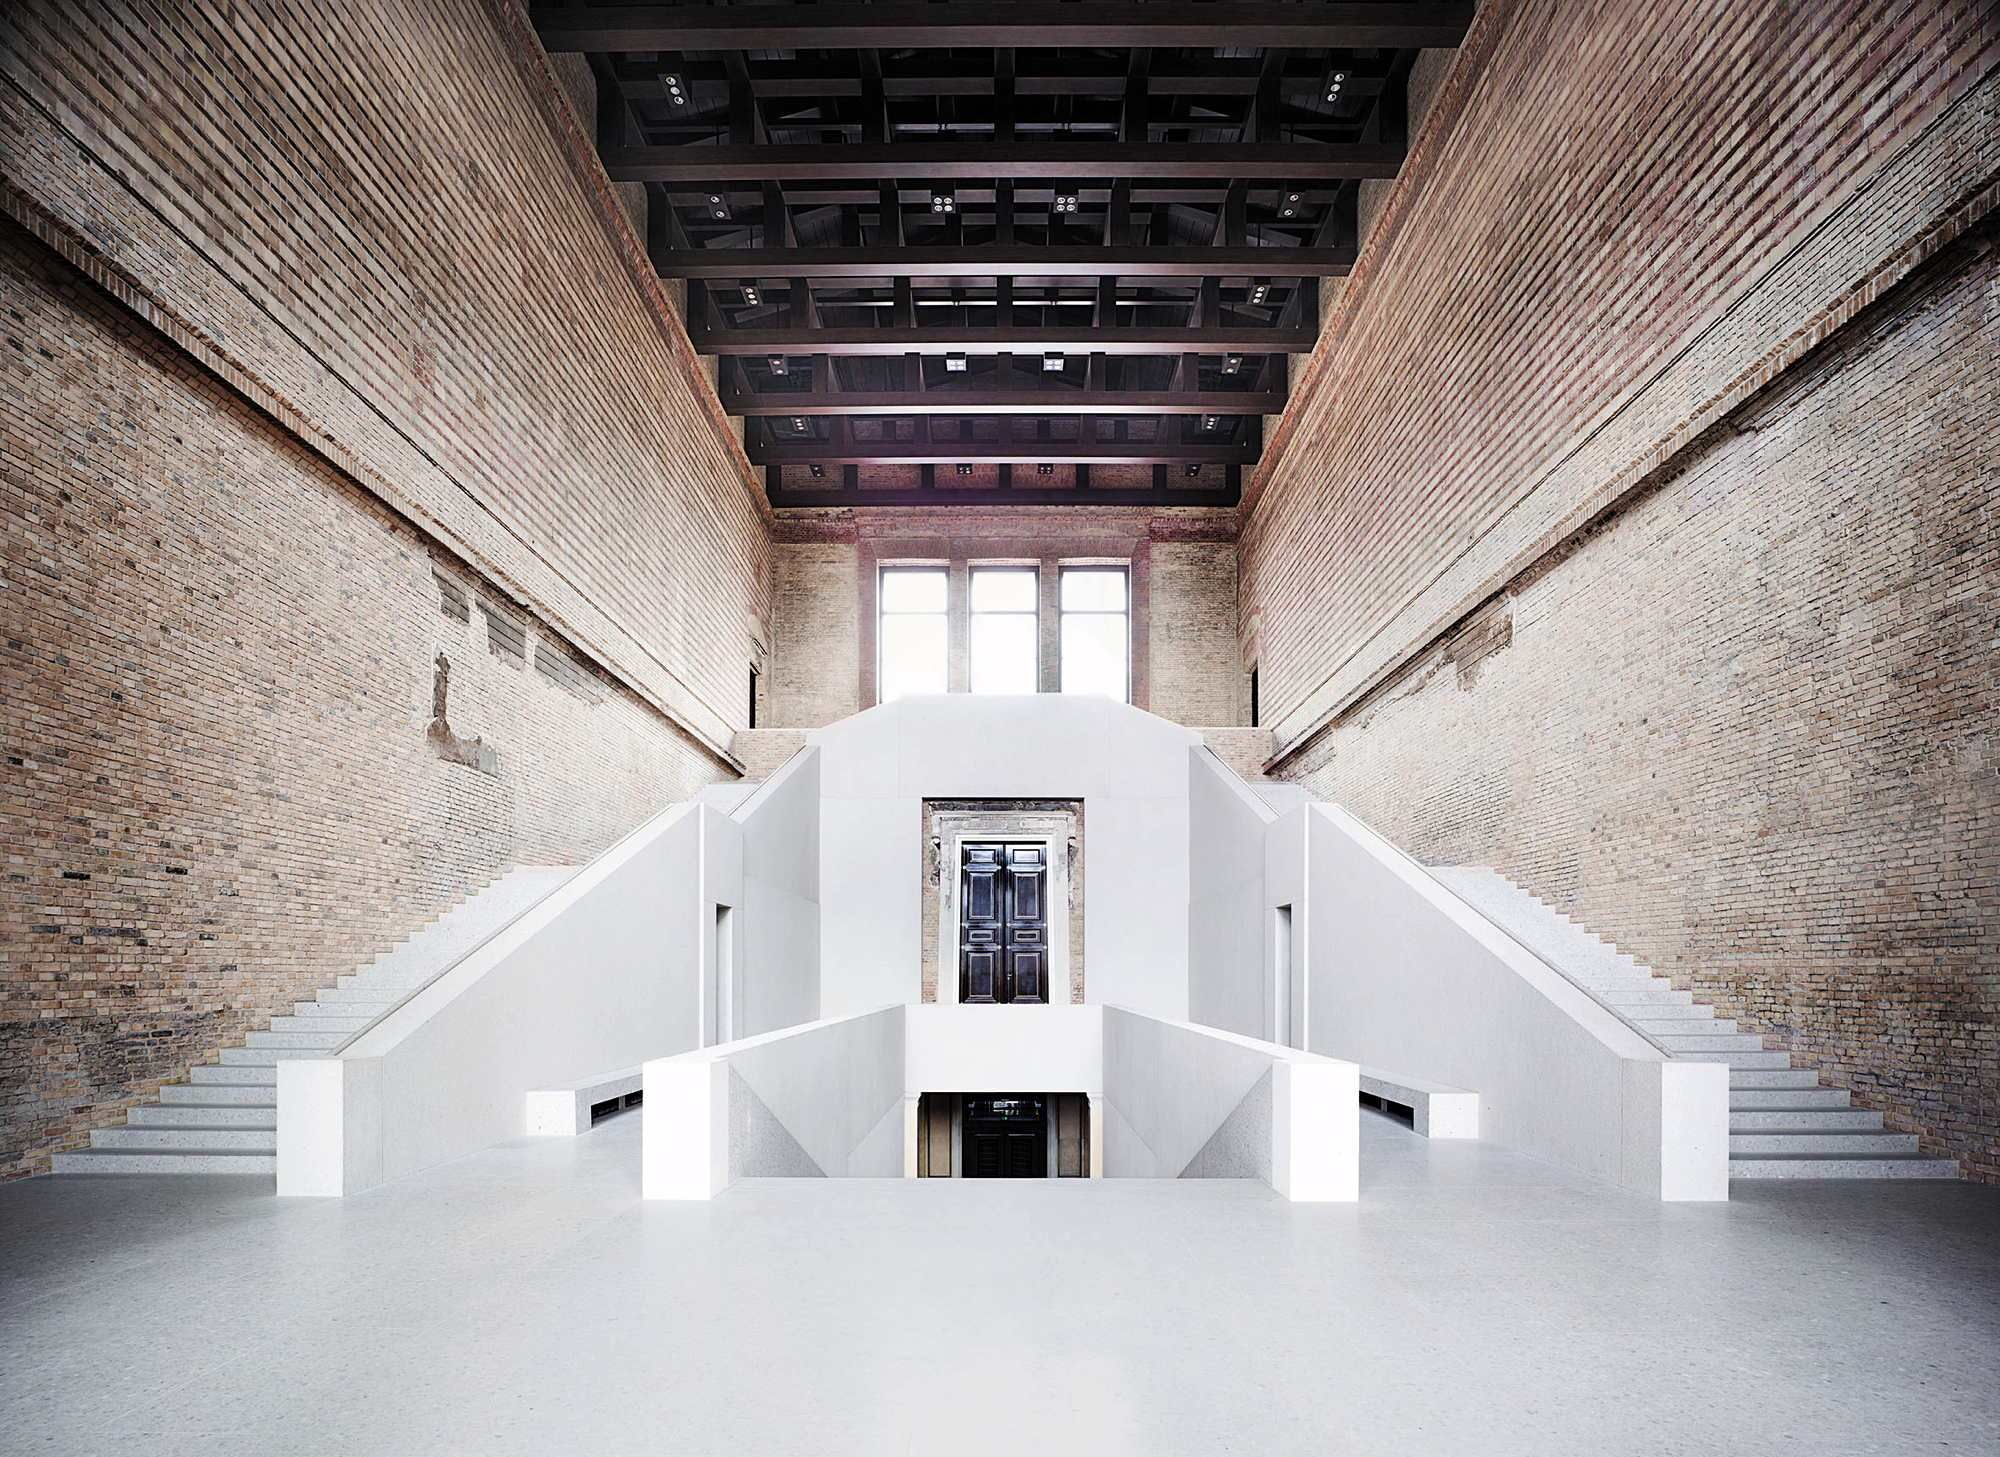 Kontexte Praemium Imperiale Geht An David Chipperfield Neues Museum Berlin Museum Architektur Museum